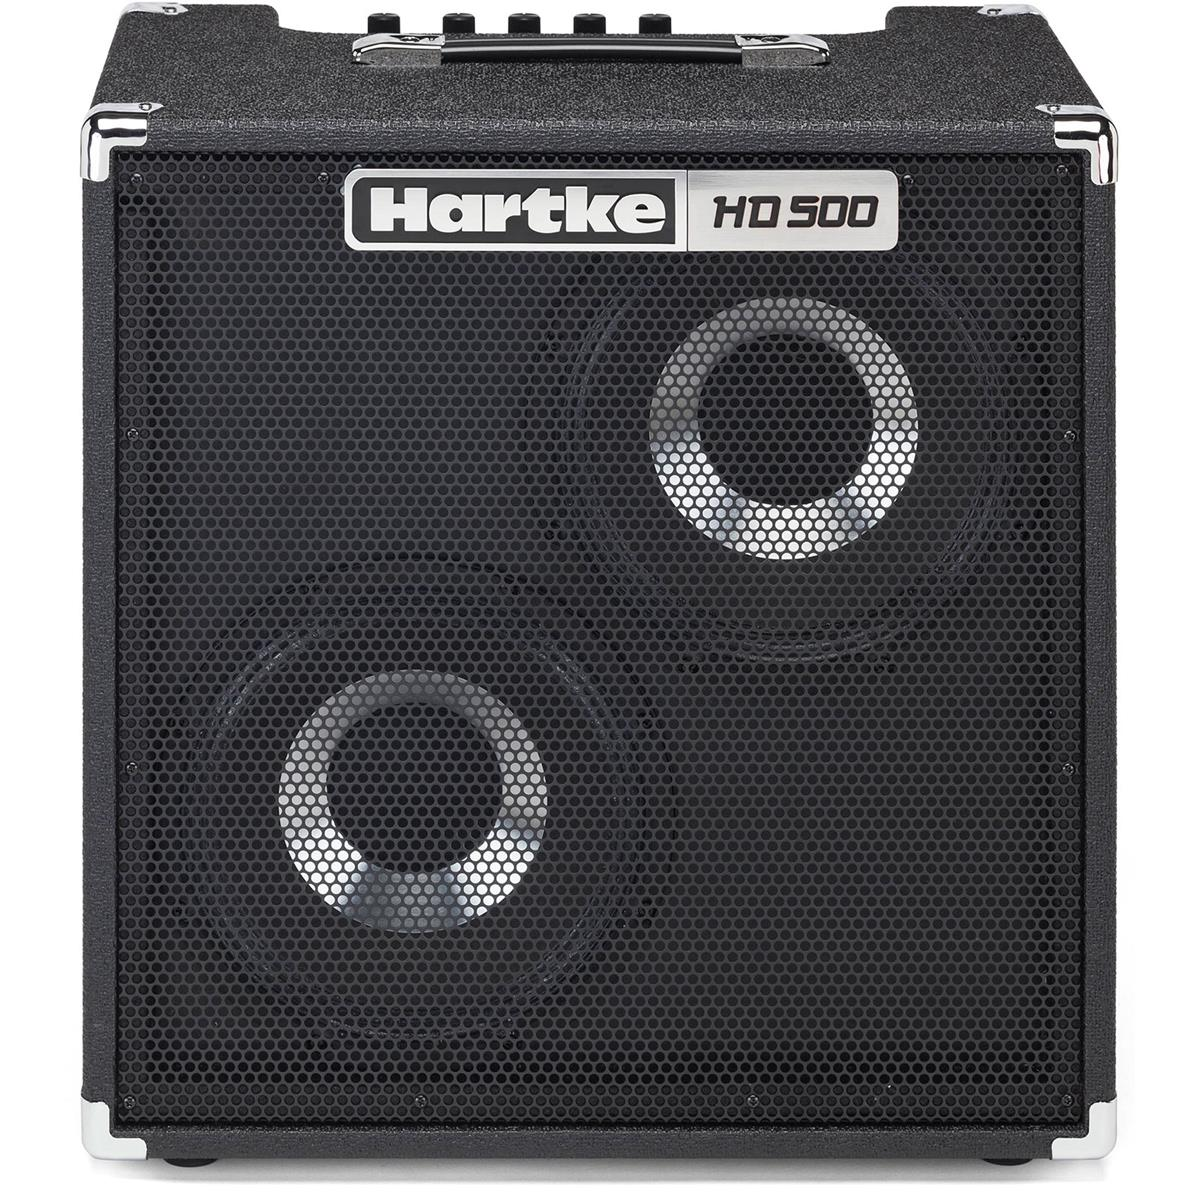 Hartke-HD500-2x10-500W-sku-2441269439006